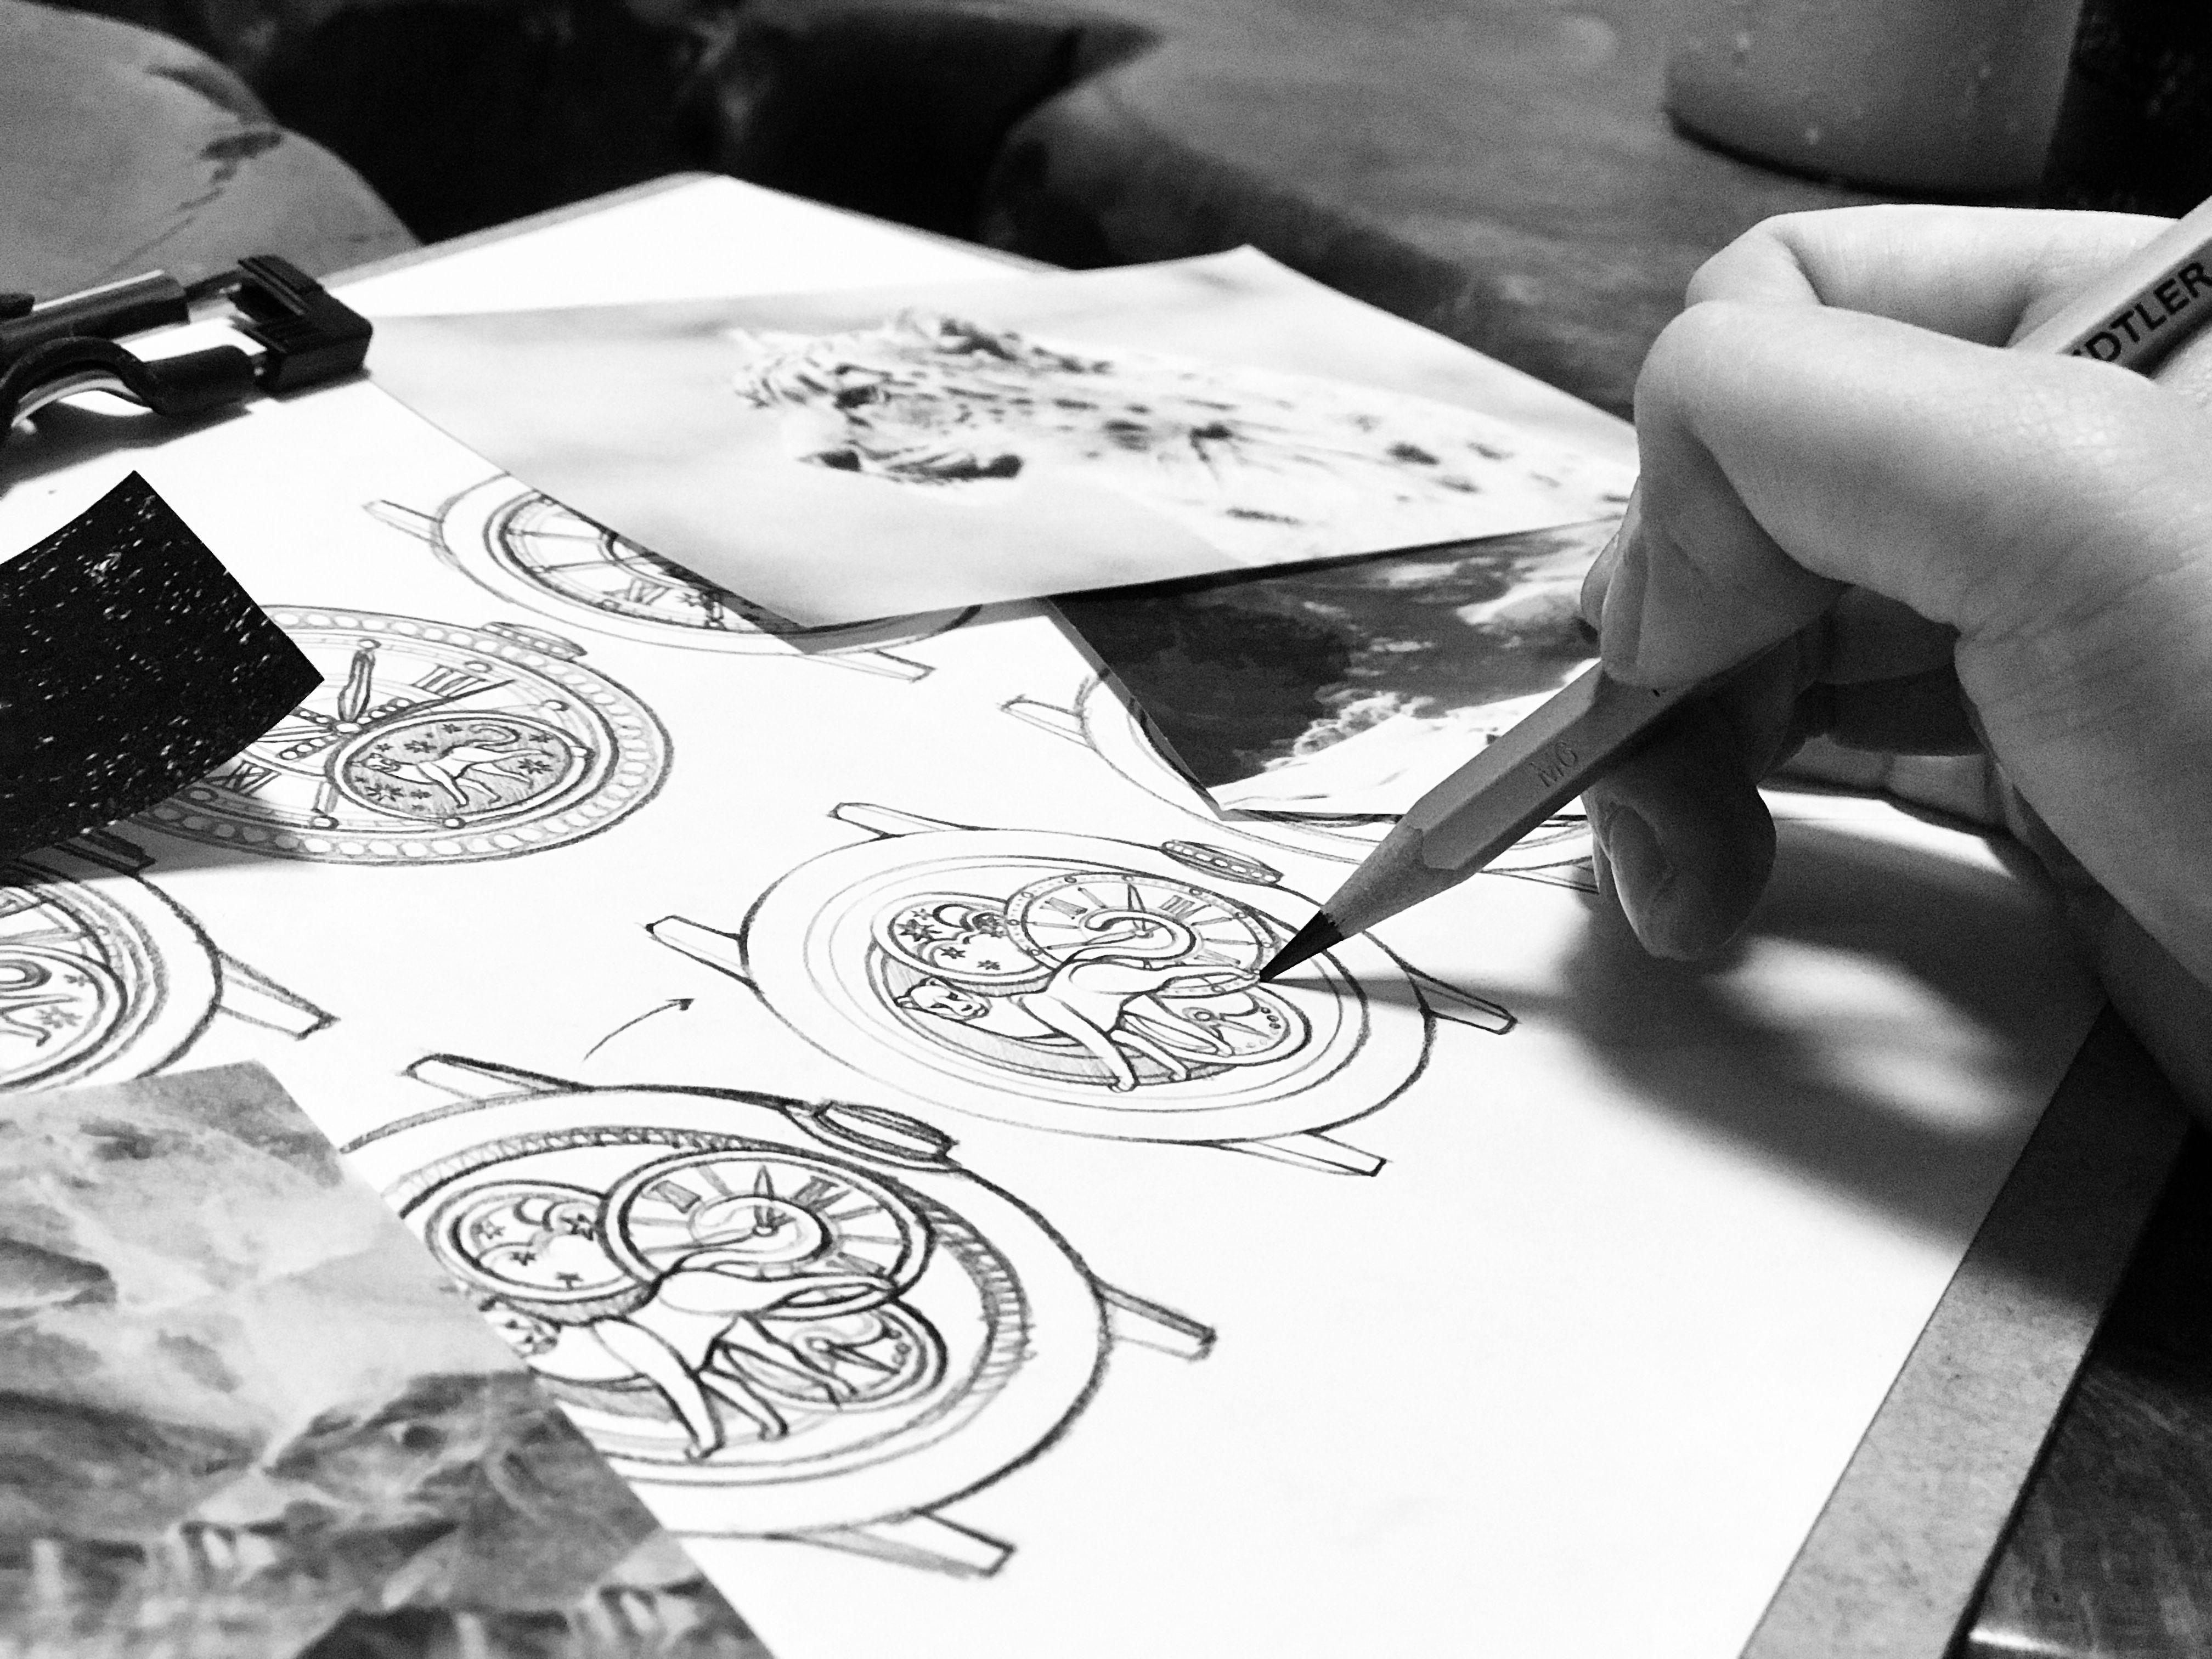 Personal Portfolio Watch Design Snow Leopard Process Idea Sketch Copyright C Hyunjiwon 2018 All Rights Re Watch Sketch Watch Drawing Snow Leopard